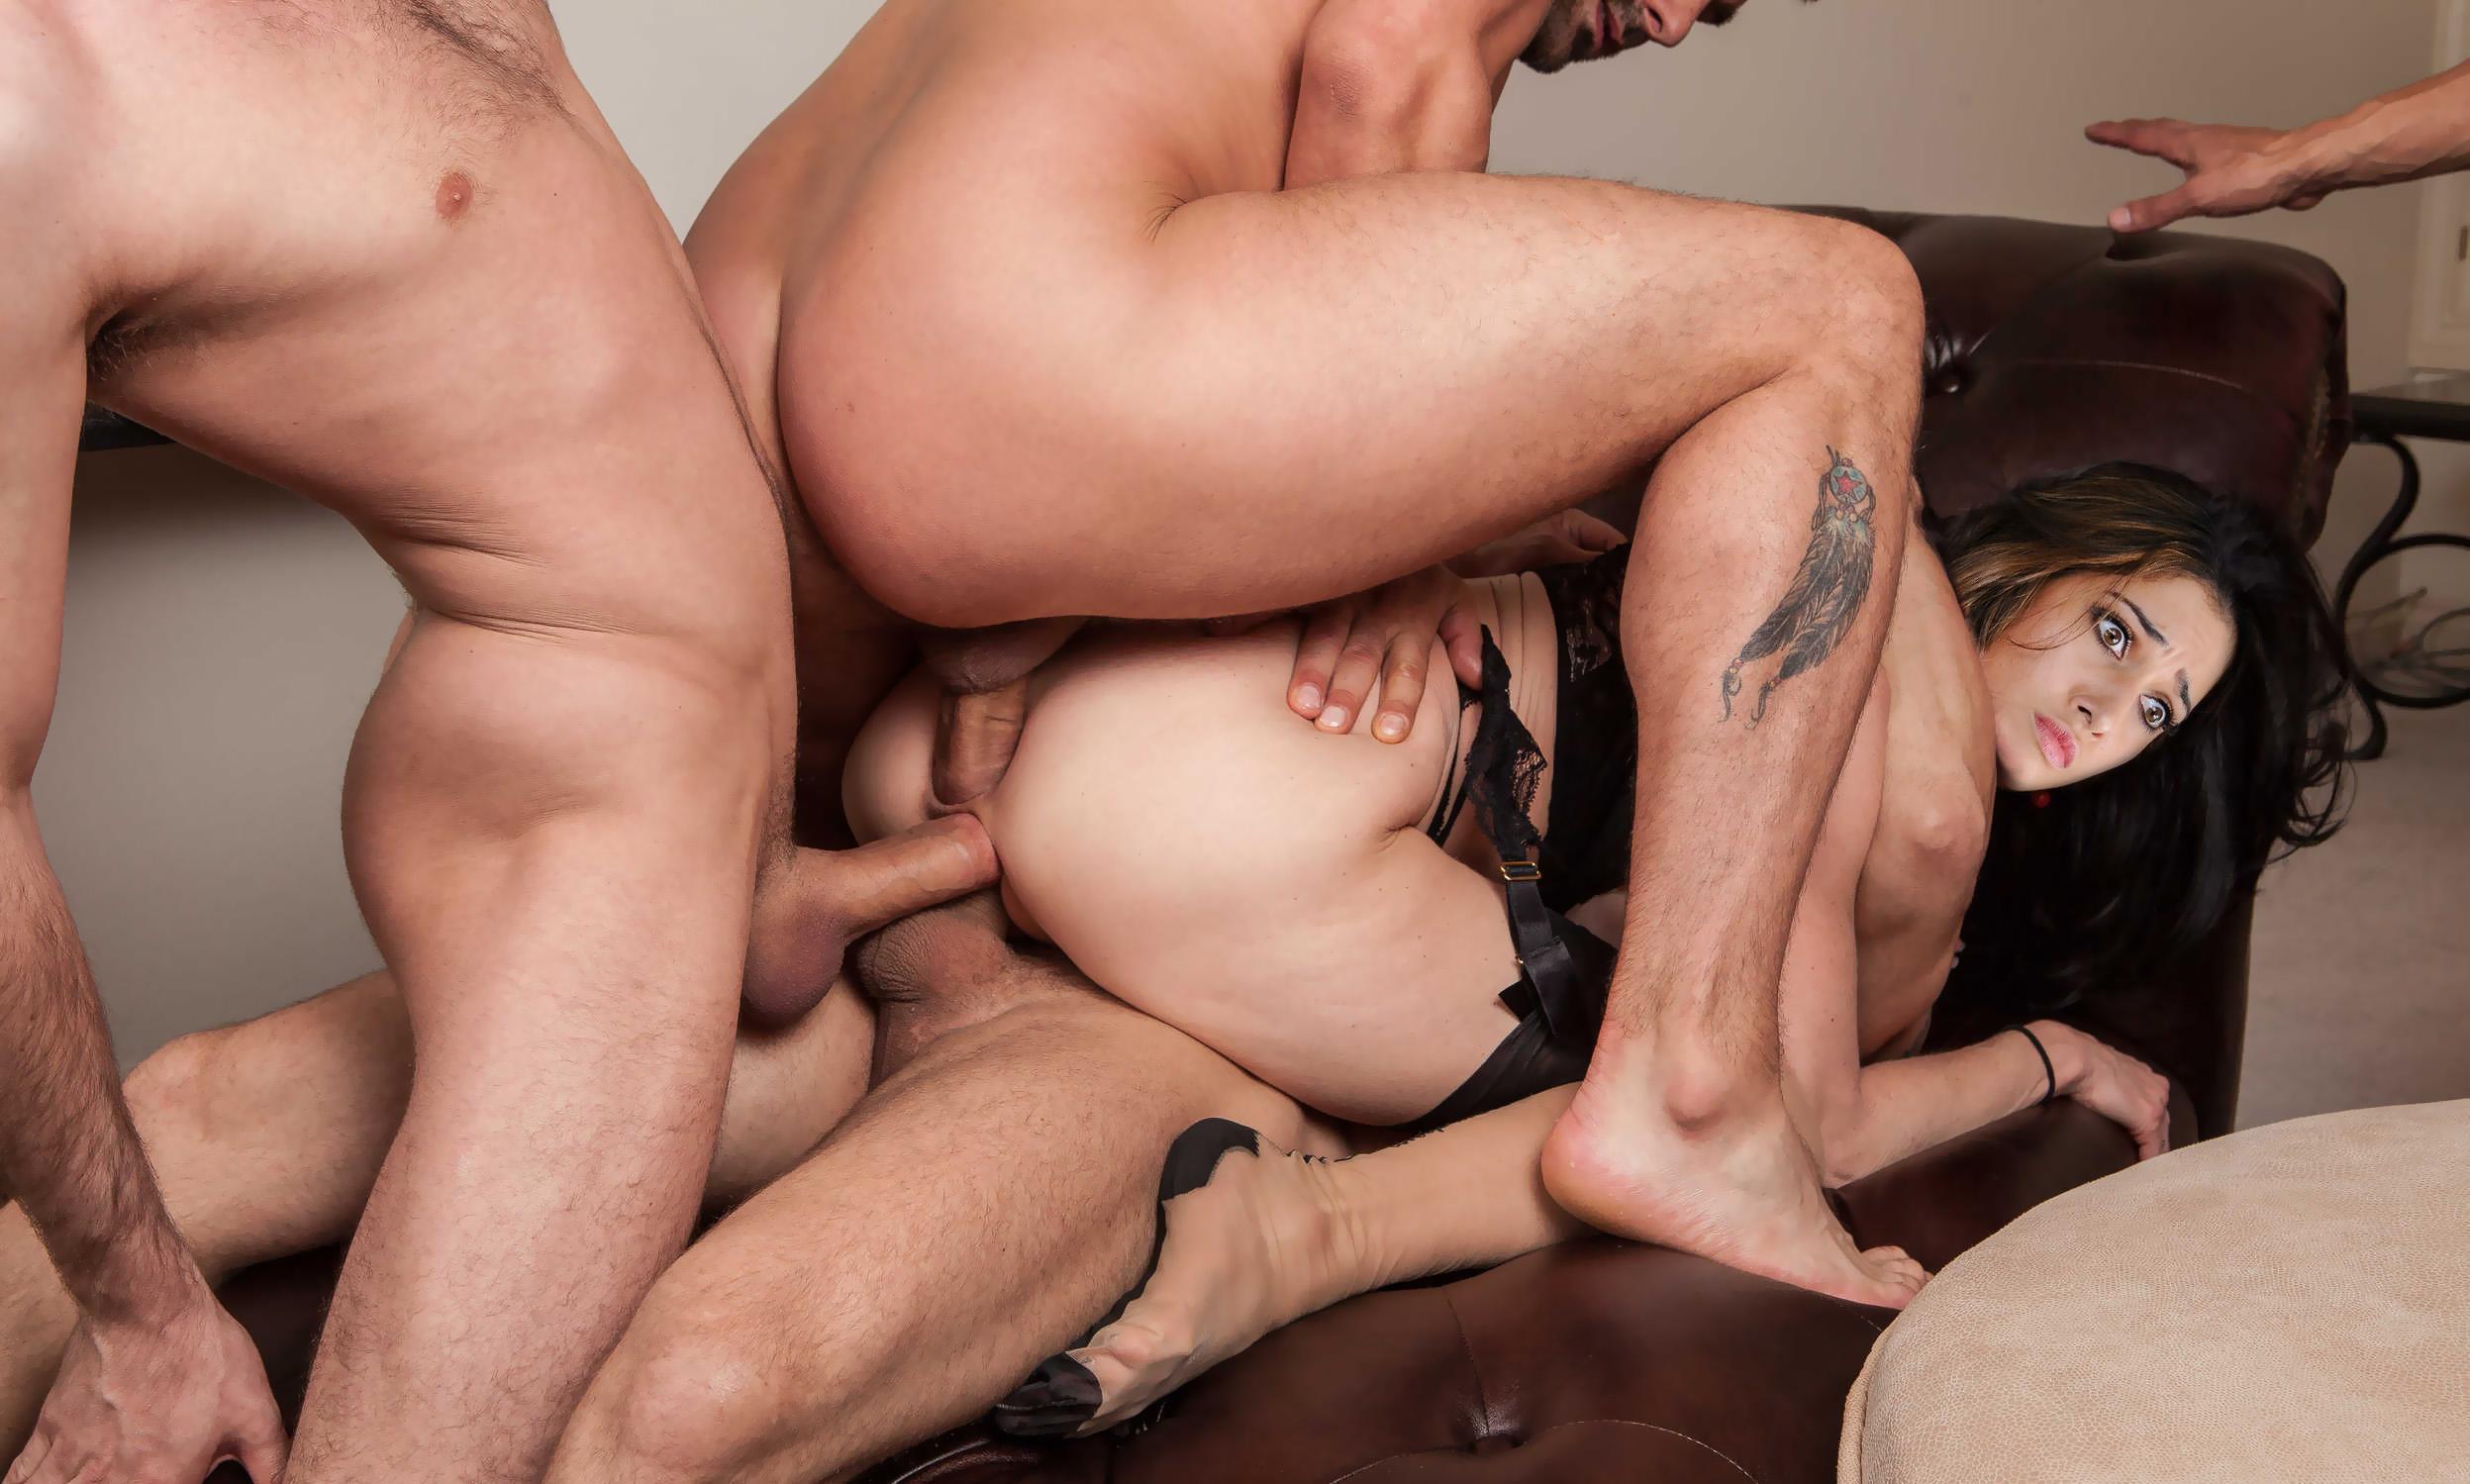 Порно Видео Группа Проникновение